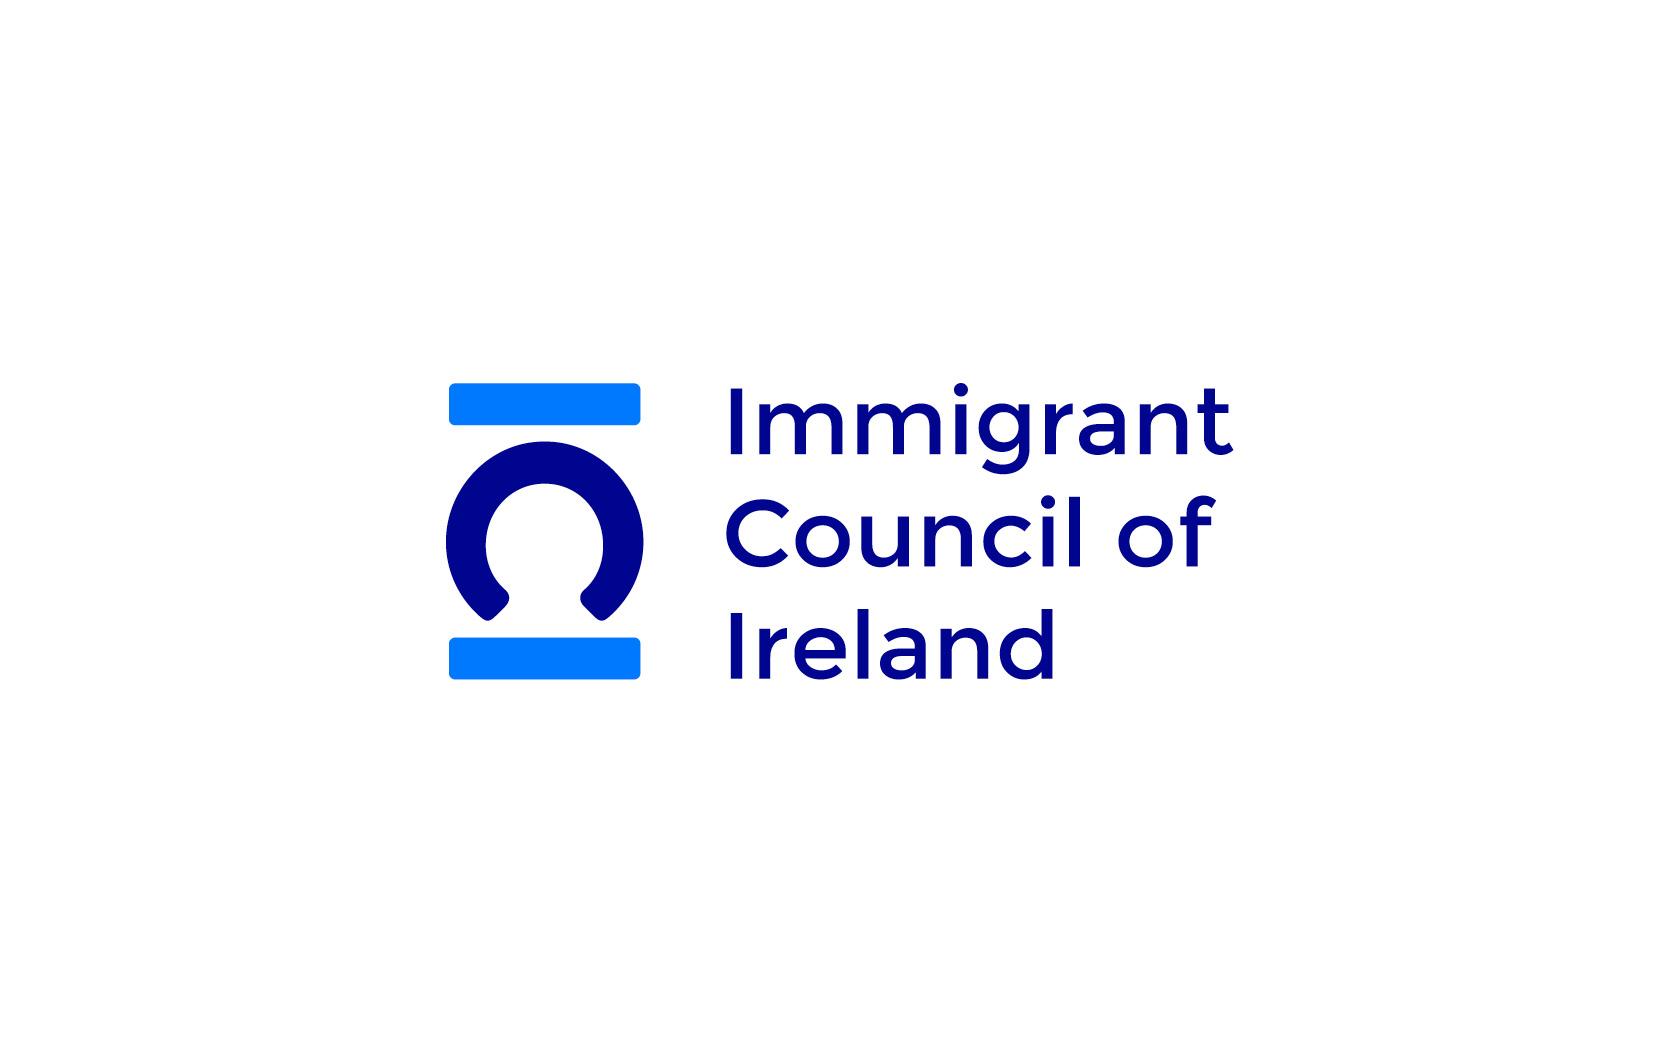 Immigrant Council of Ireland logo design and graphic design